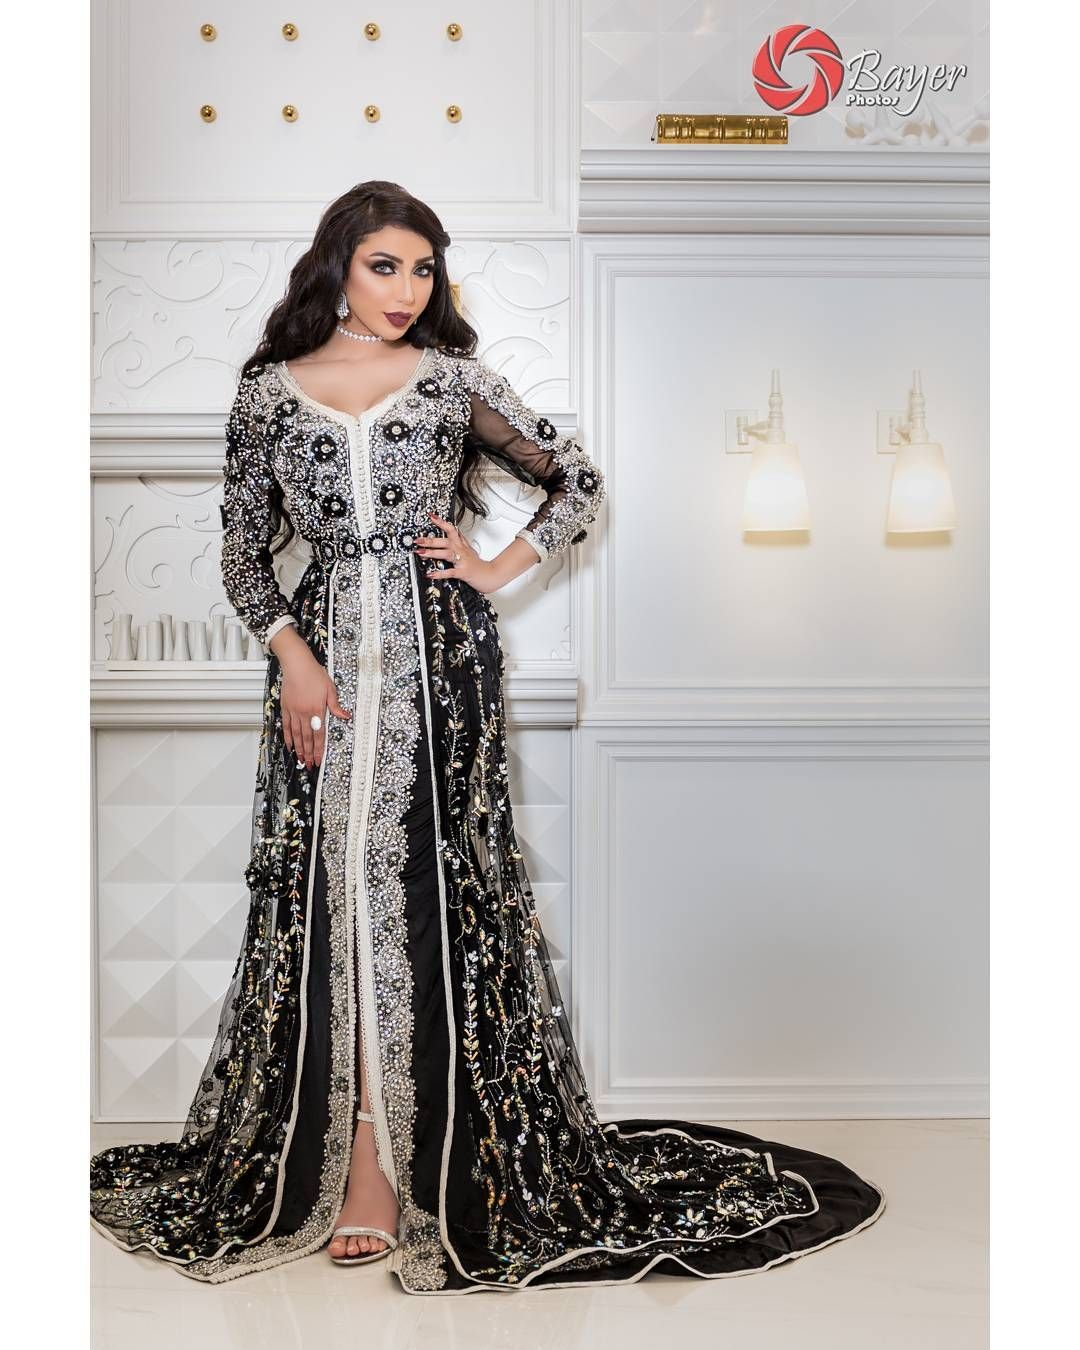 caftan | moroccan dress, caftan dress, moroccan fashion